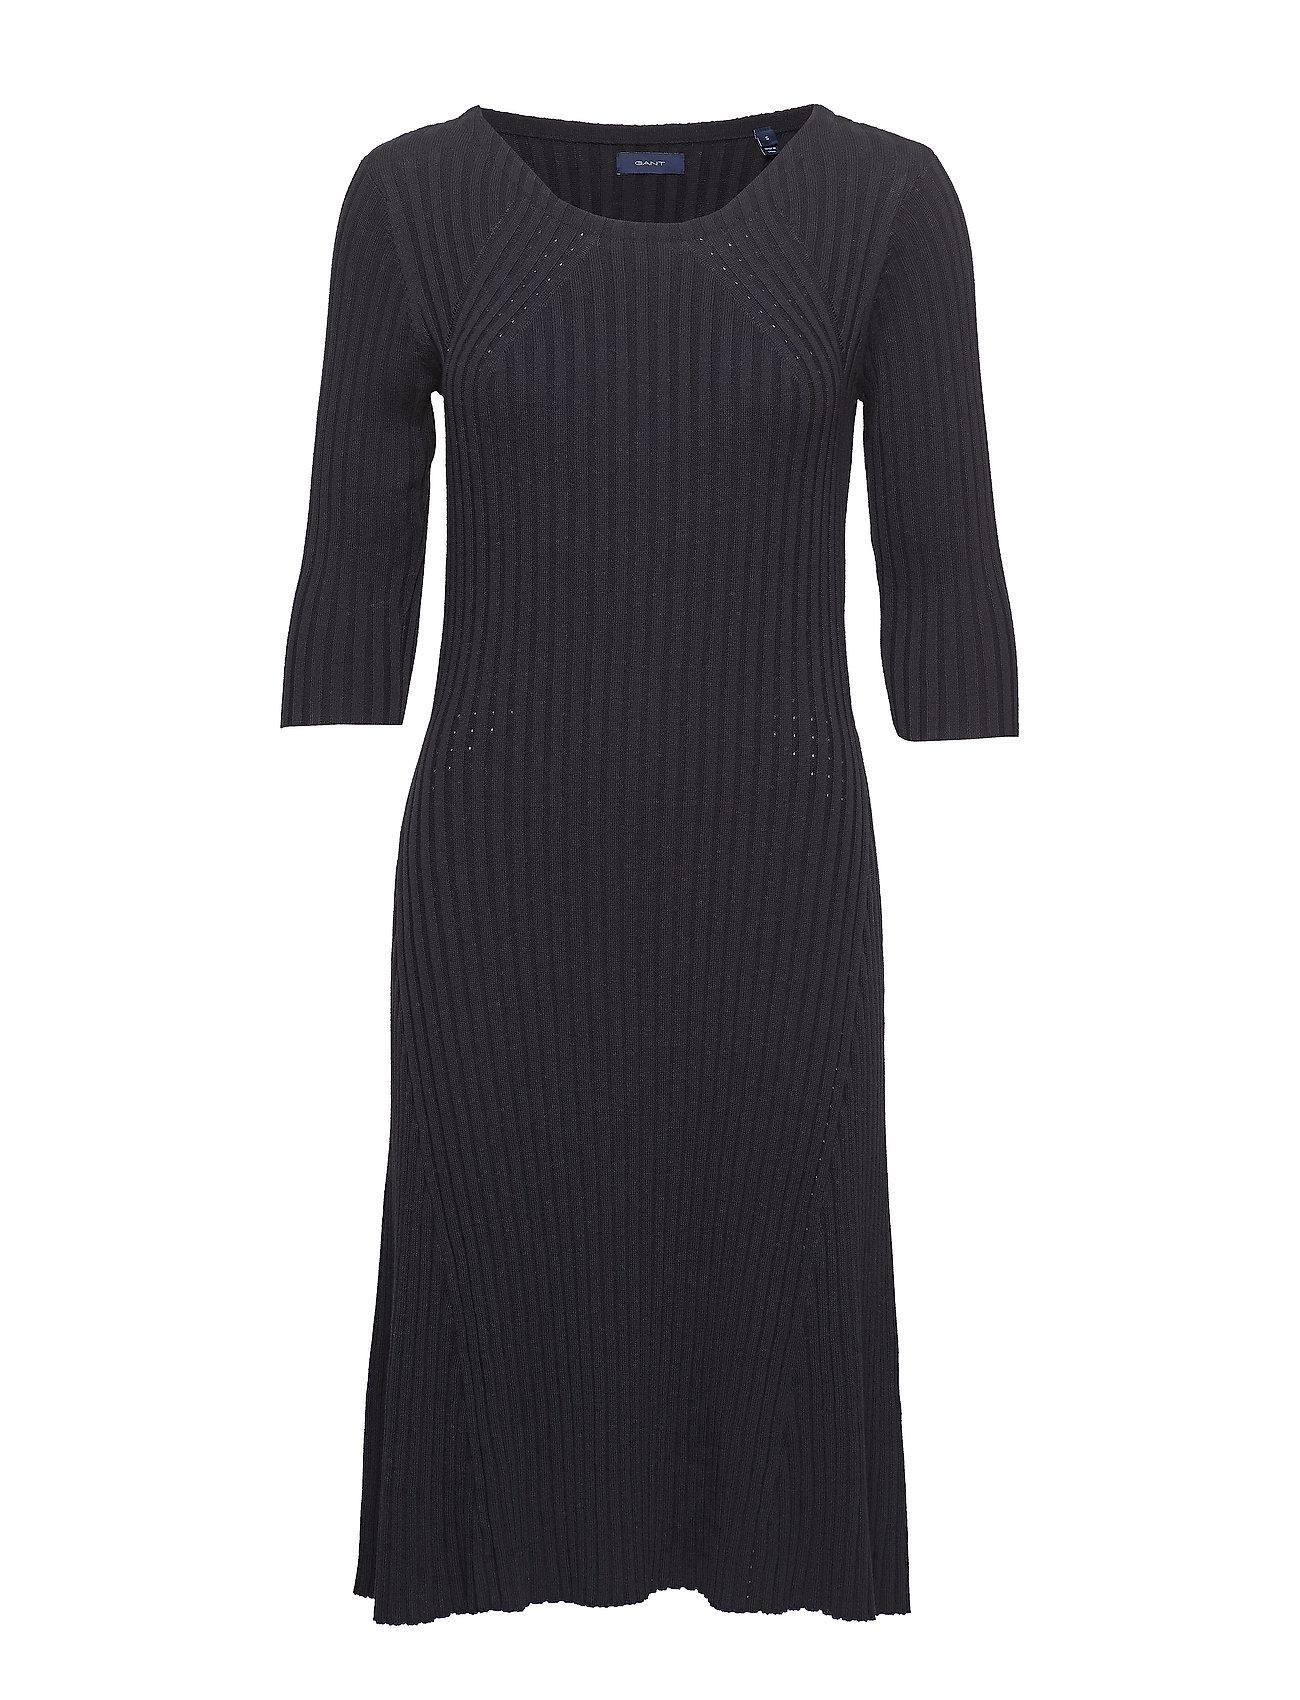 Image of D1. Knitted Dress Knælang Kjole Blå GANT (3182128987)